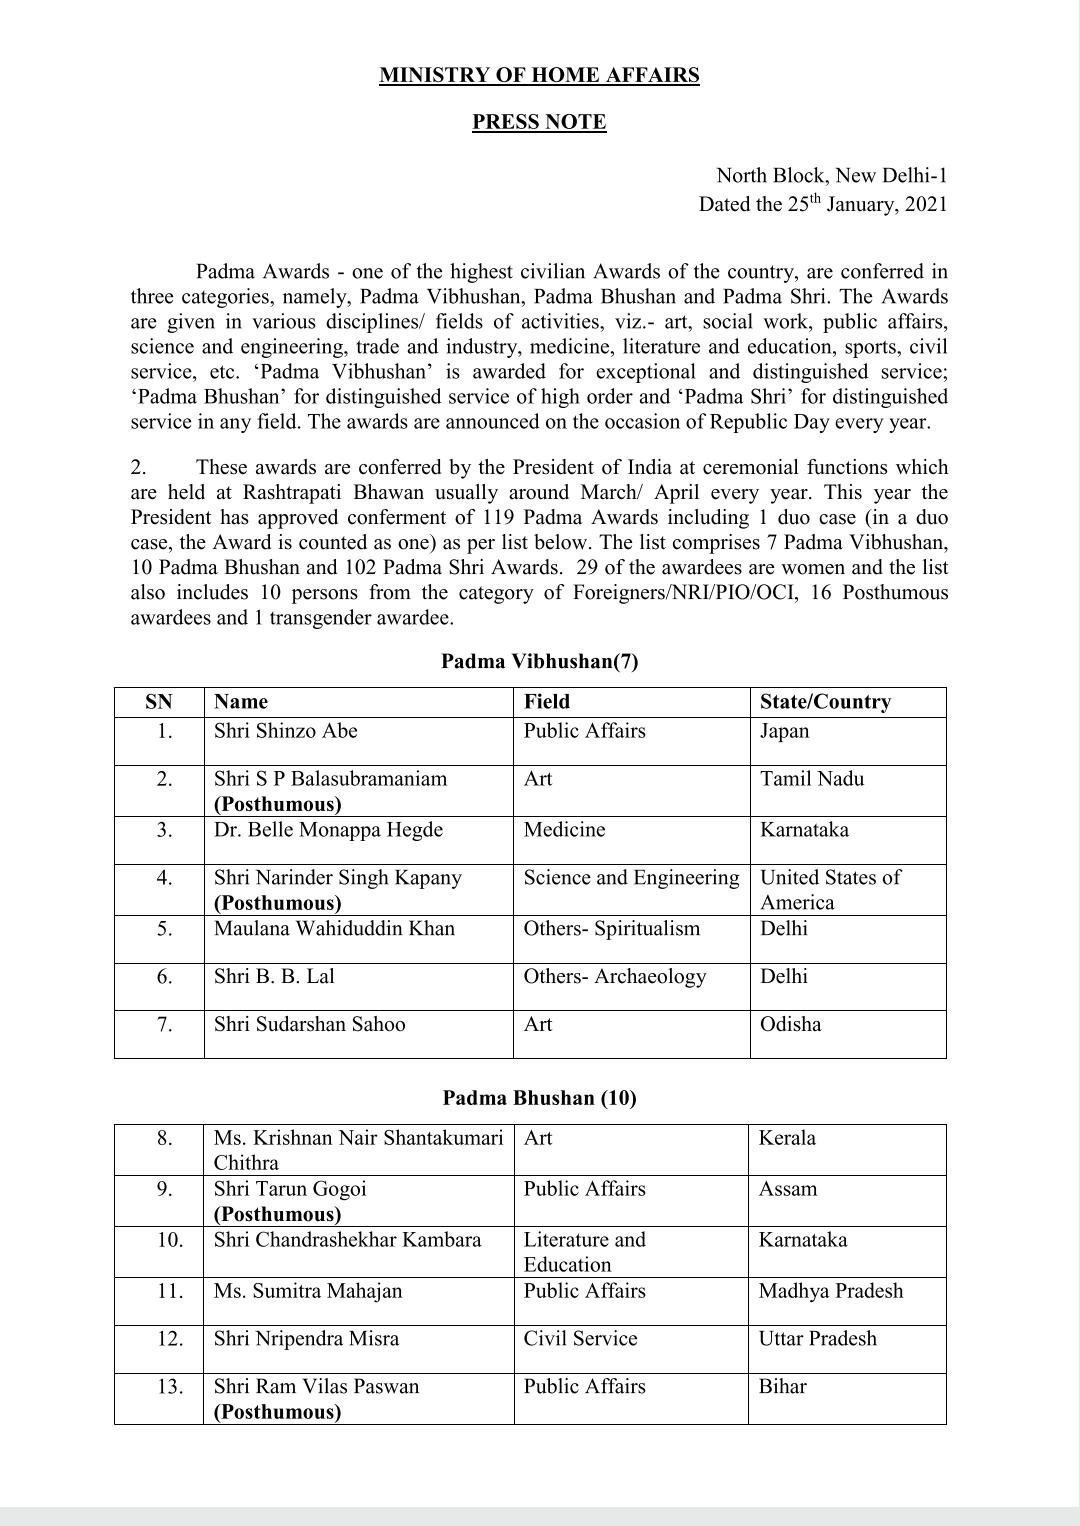 Padma Vibhushan, Padma Bhushan, Padma Shri Awards published by 2021